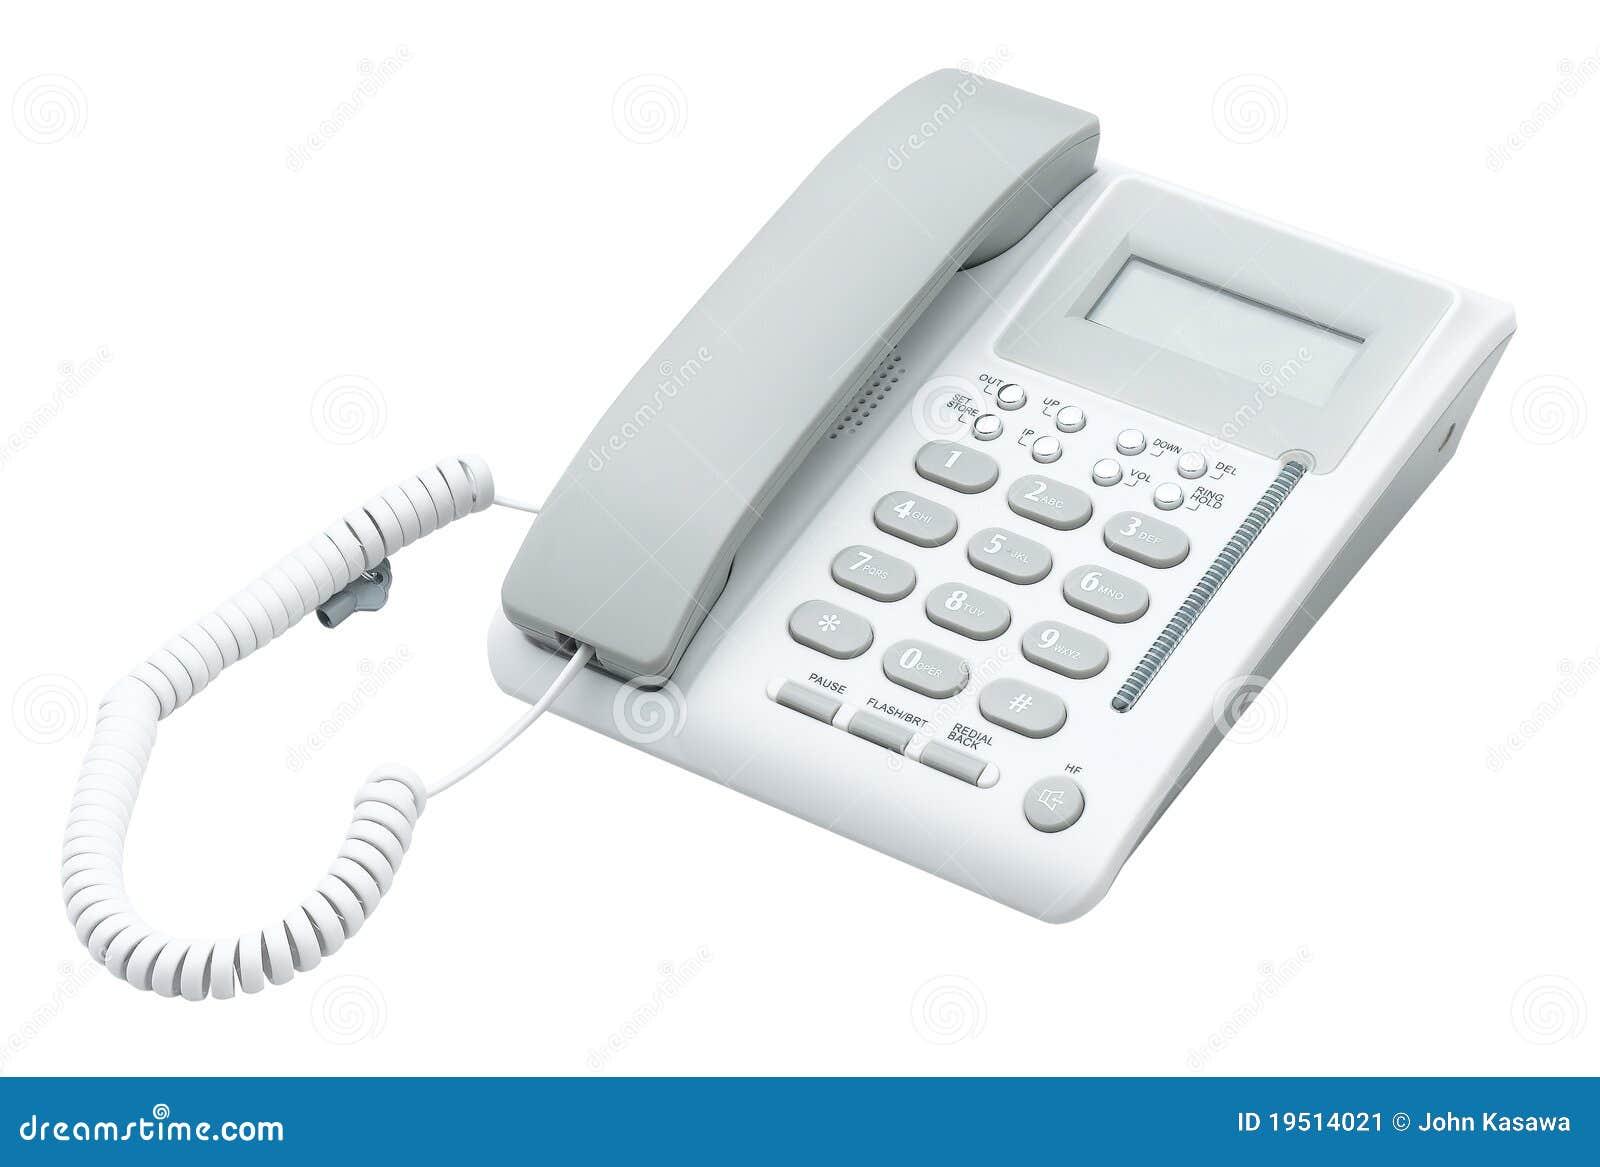 stock image nice design telephone